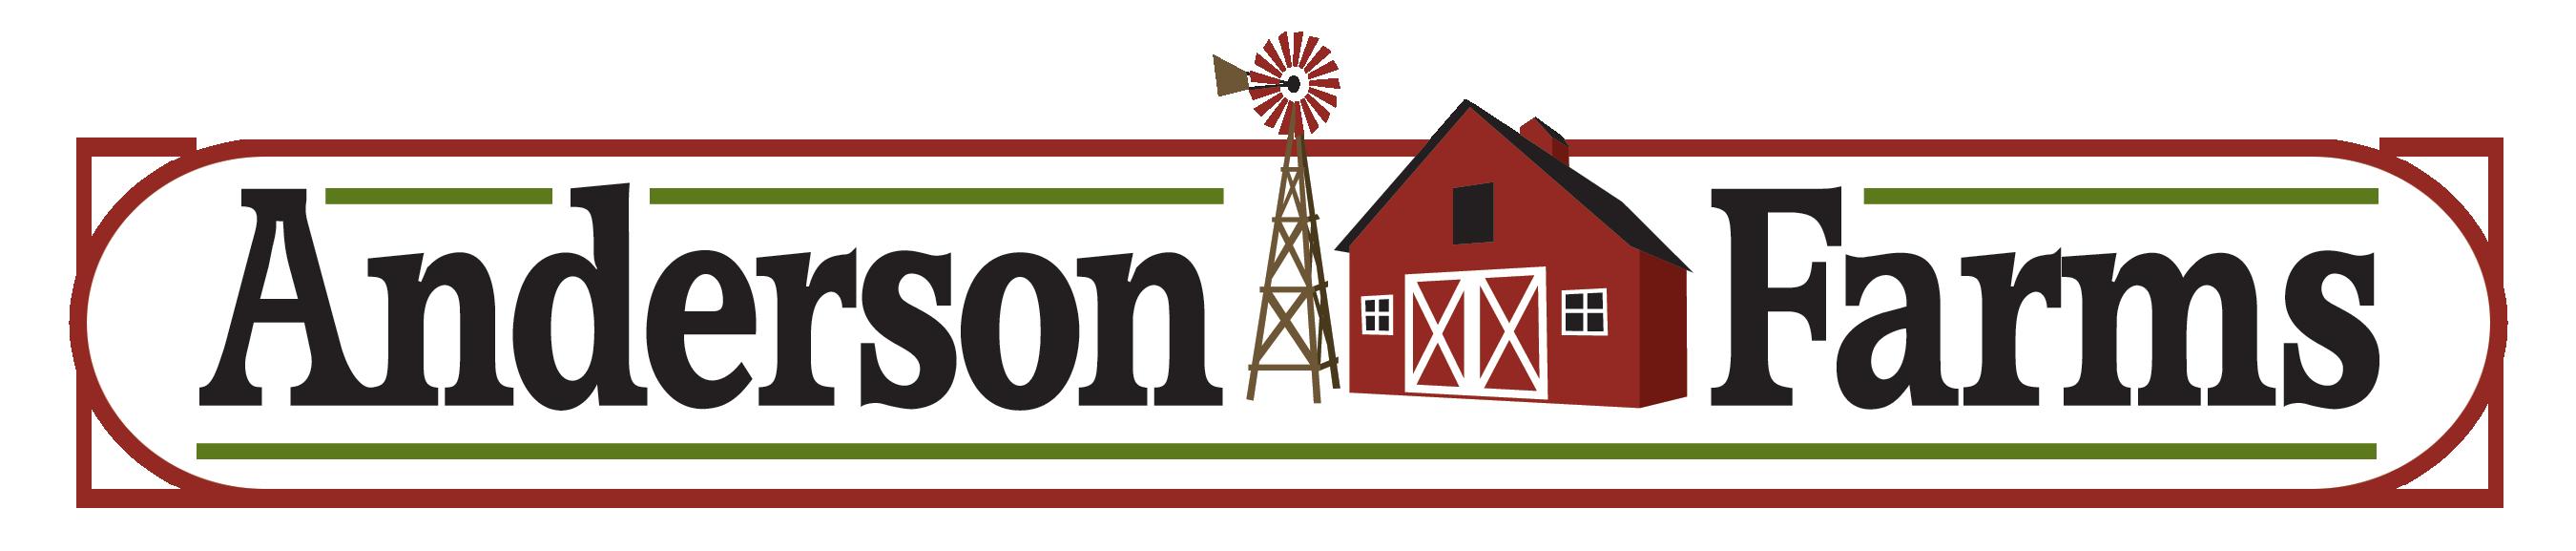 ANDERSON-FARMS-Horz-4cWEB